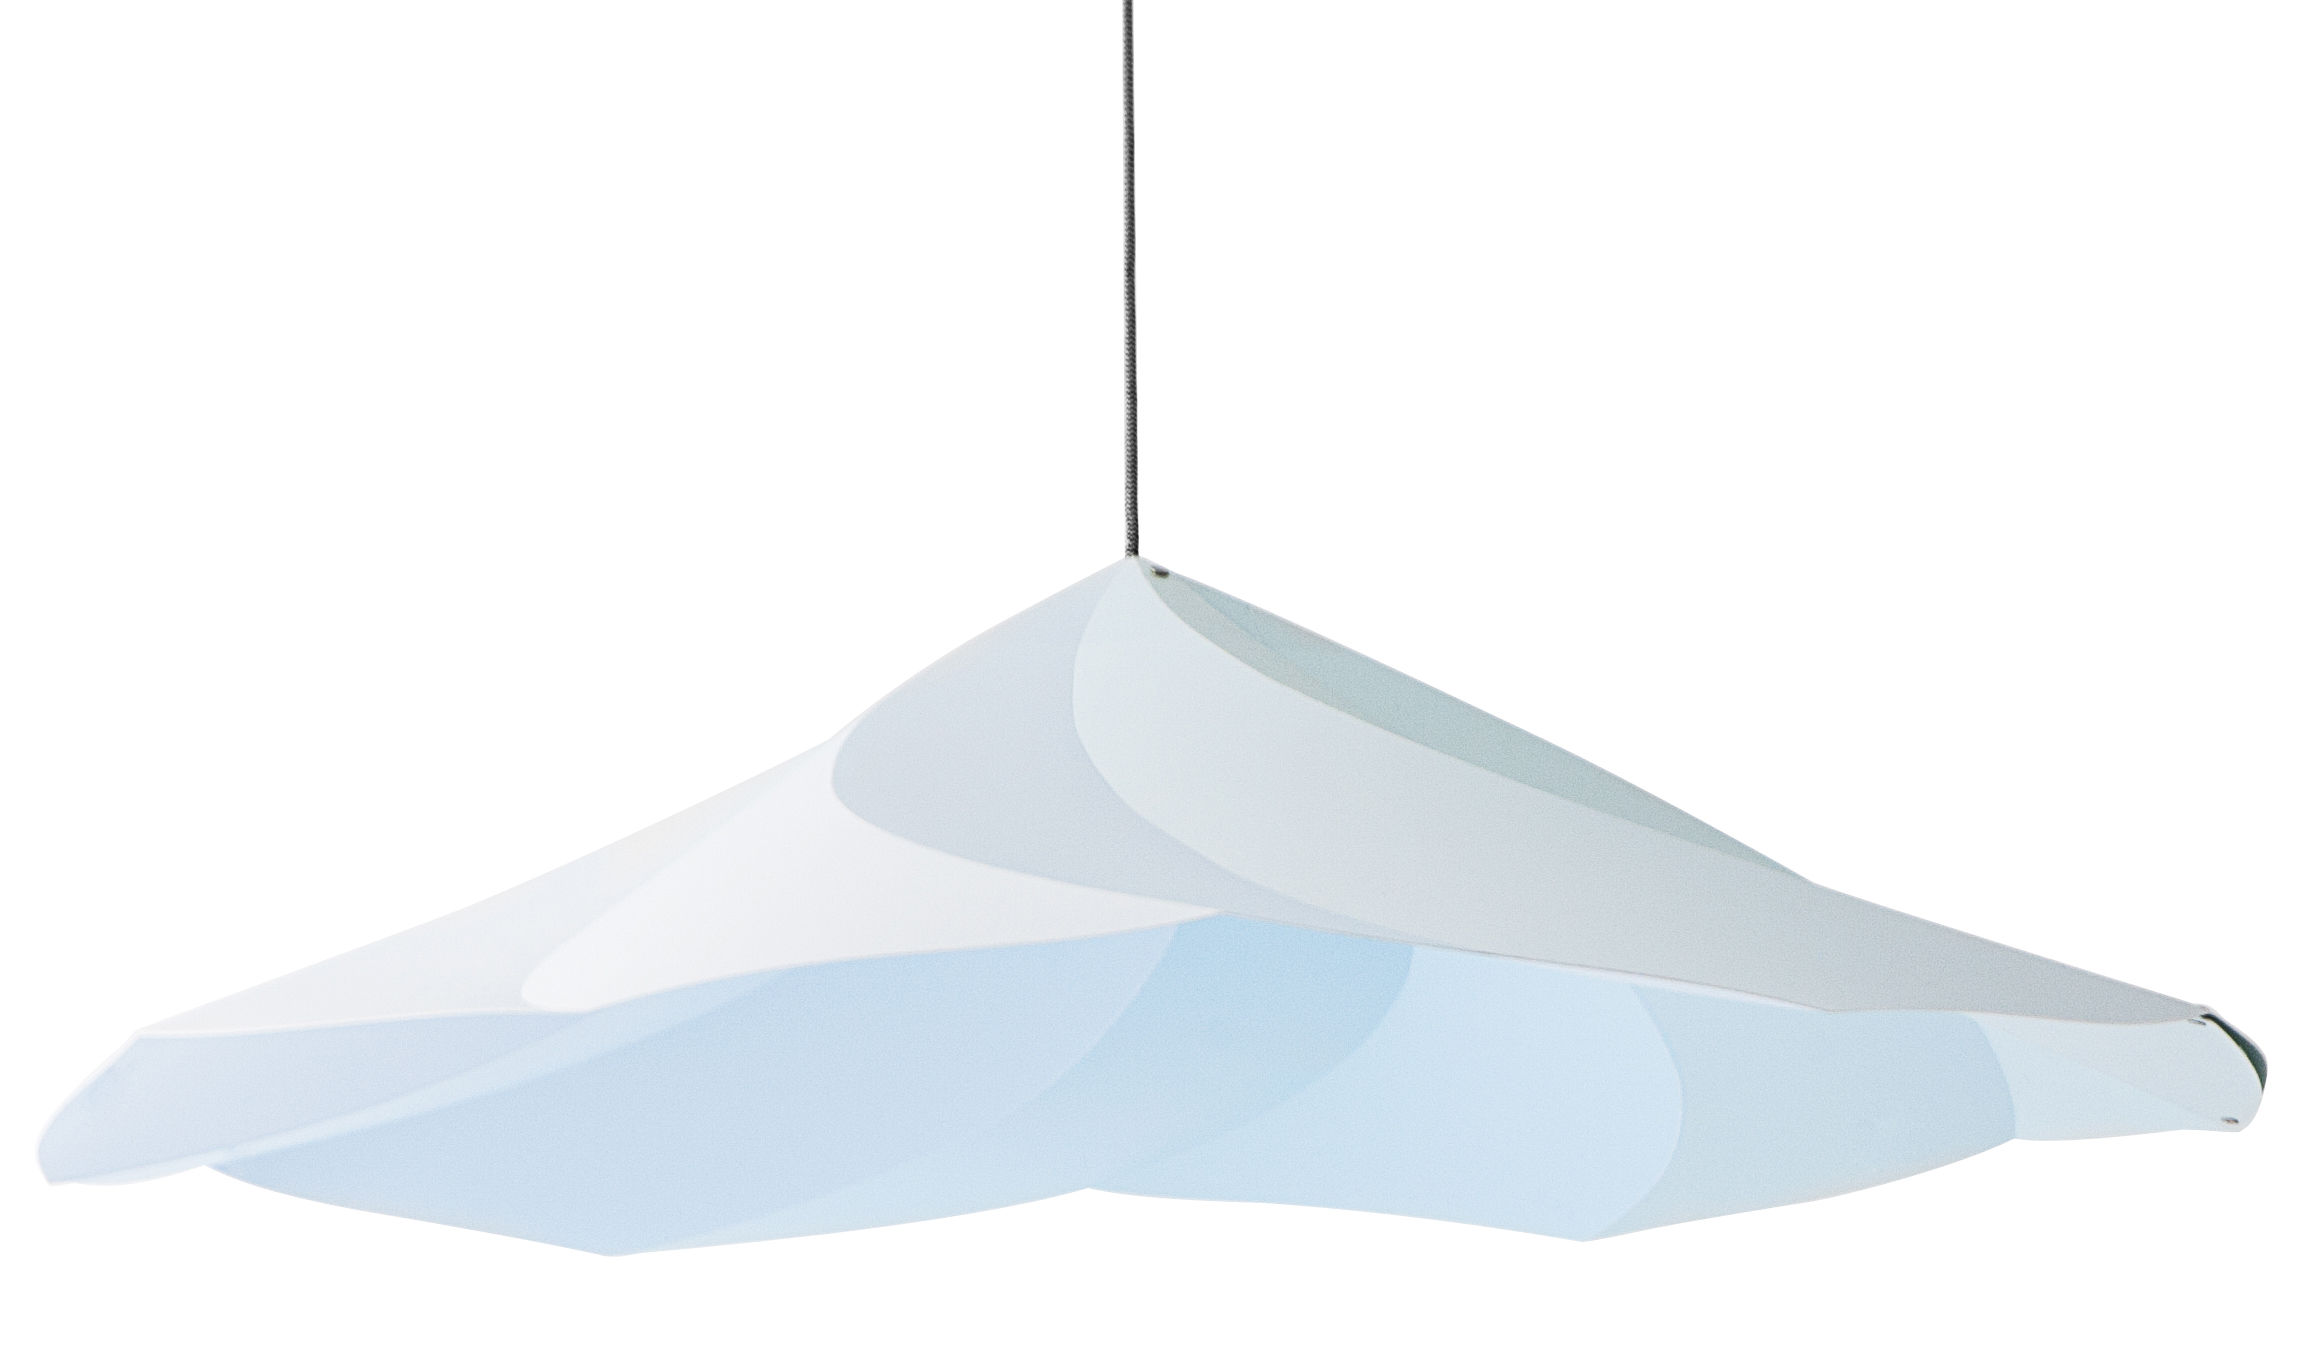 Lighting - Pendant Lighting - Chantilly Pendant by Moustache - Blue - Recycled polypropylene